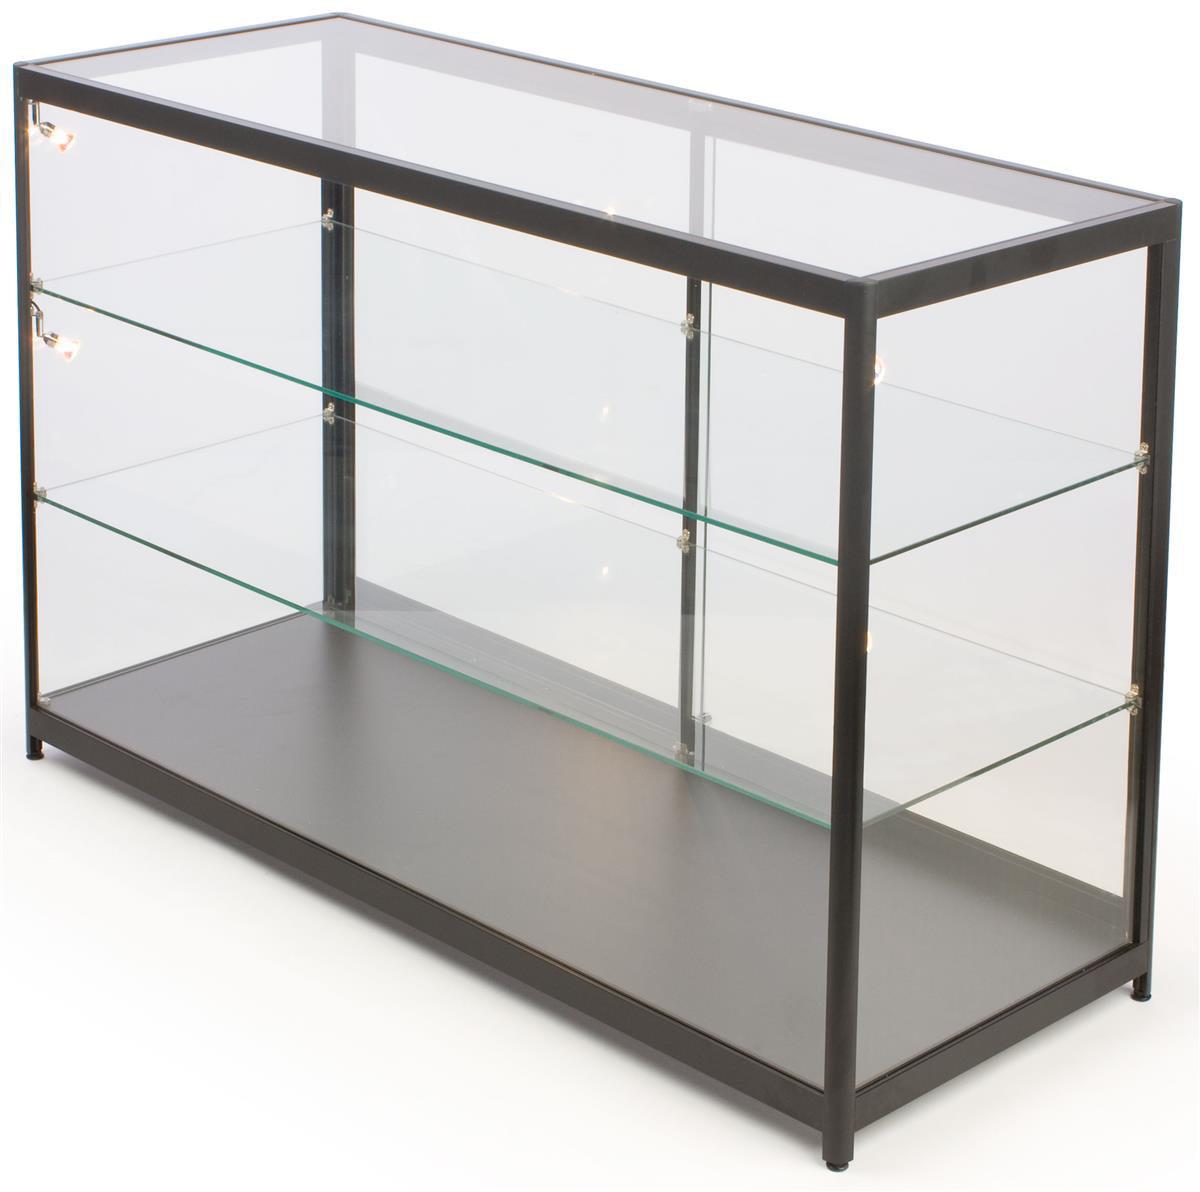 Displays2go Free-Standing Glass Display Case, 60 x 38 x 2...